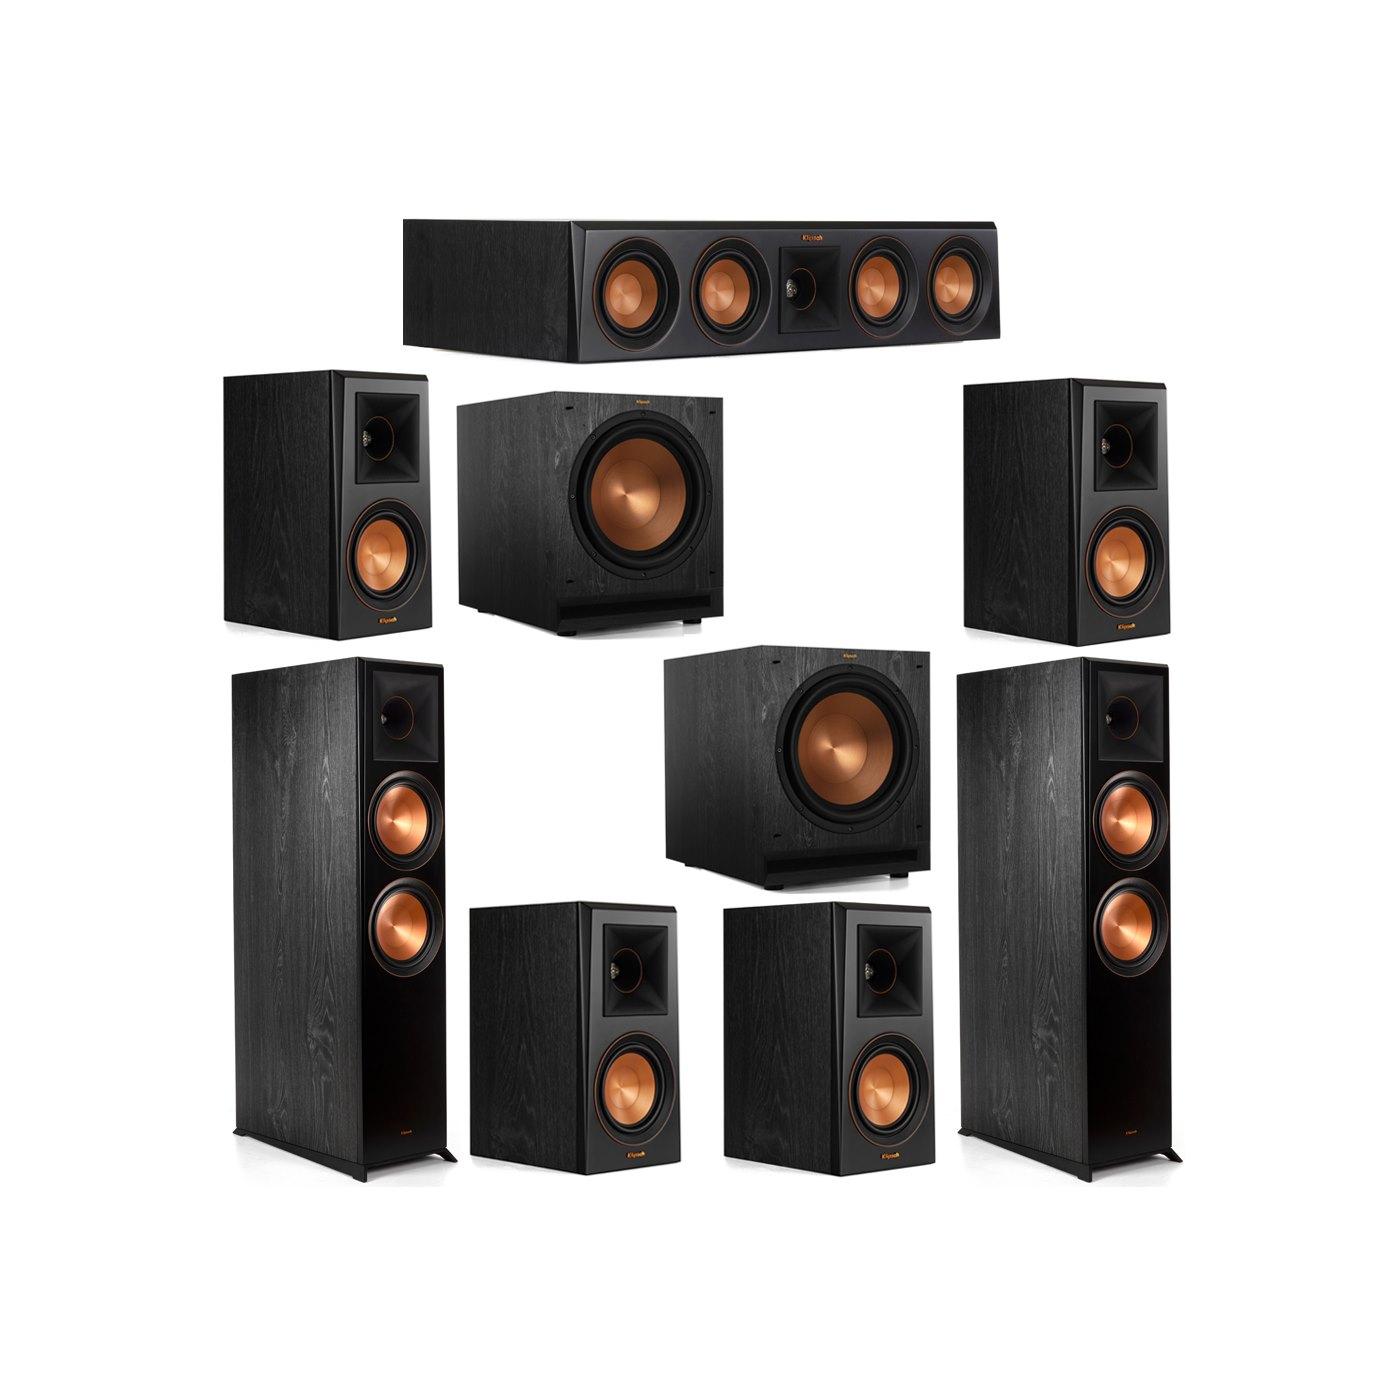 Klipsch 7.2 System with 2 RP-8000F Floorstanding Speakers, 1 Klipsch RP-404C Center Speaker, 4 Klipsch RP-500M Surround Speakers, 2 Klipsch SPL-120 Subwoofers